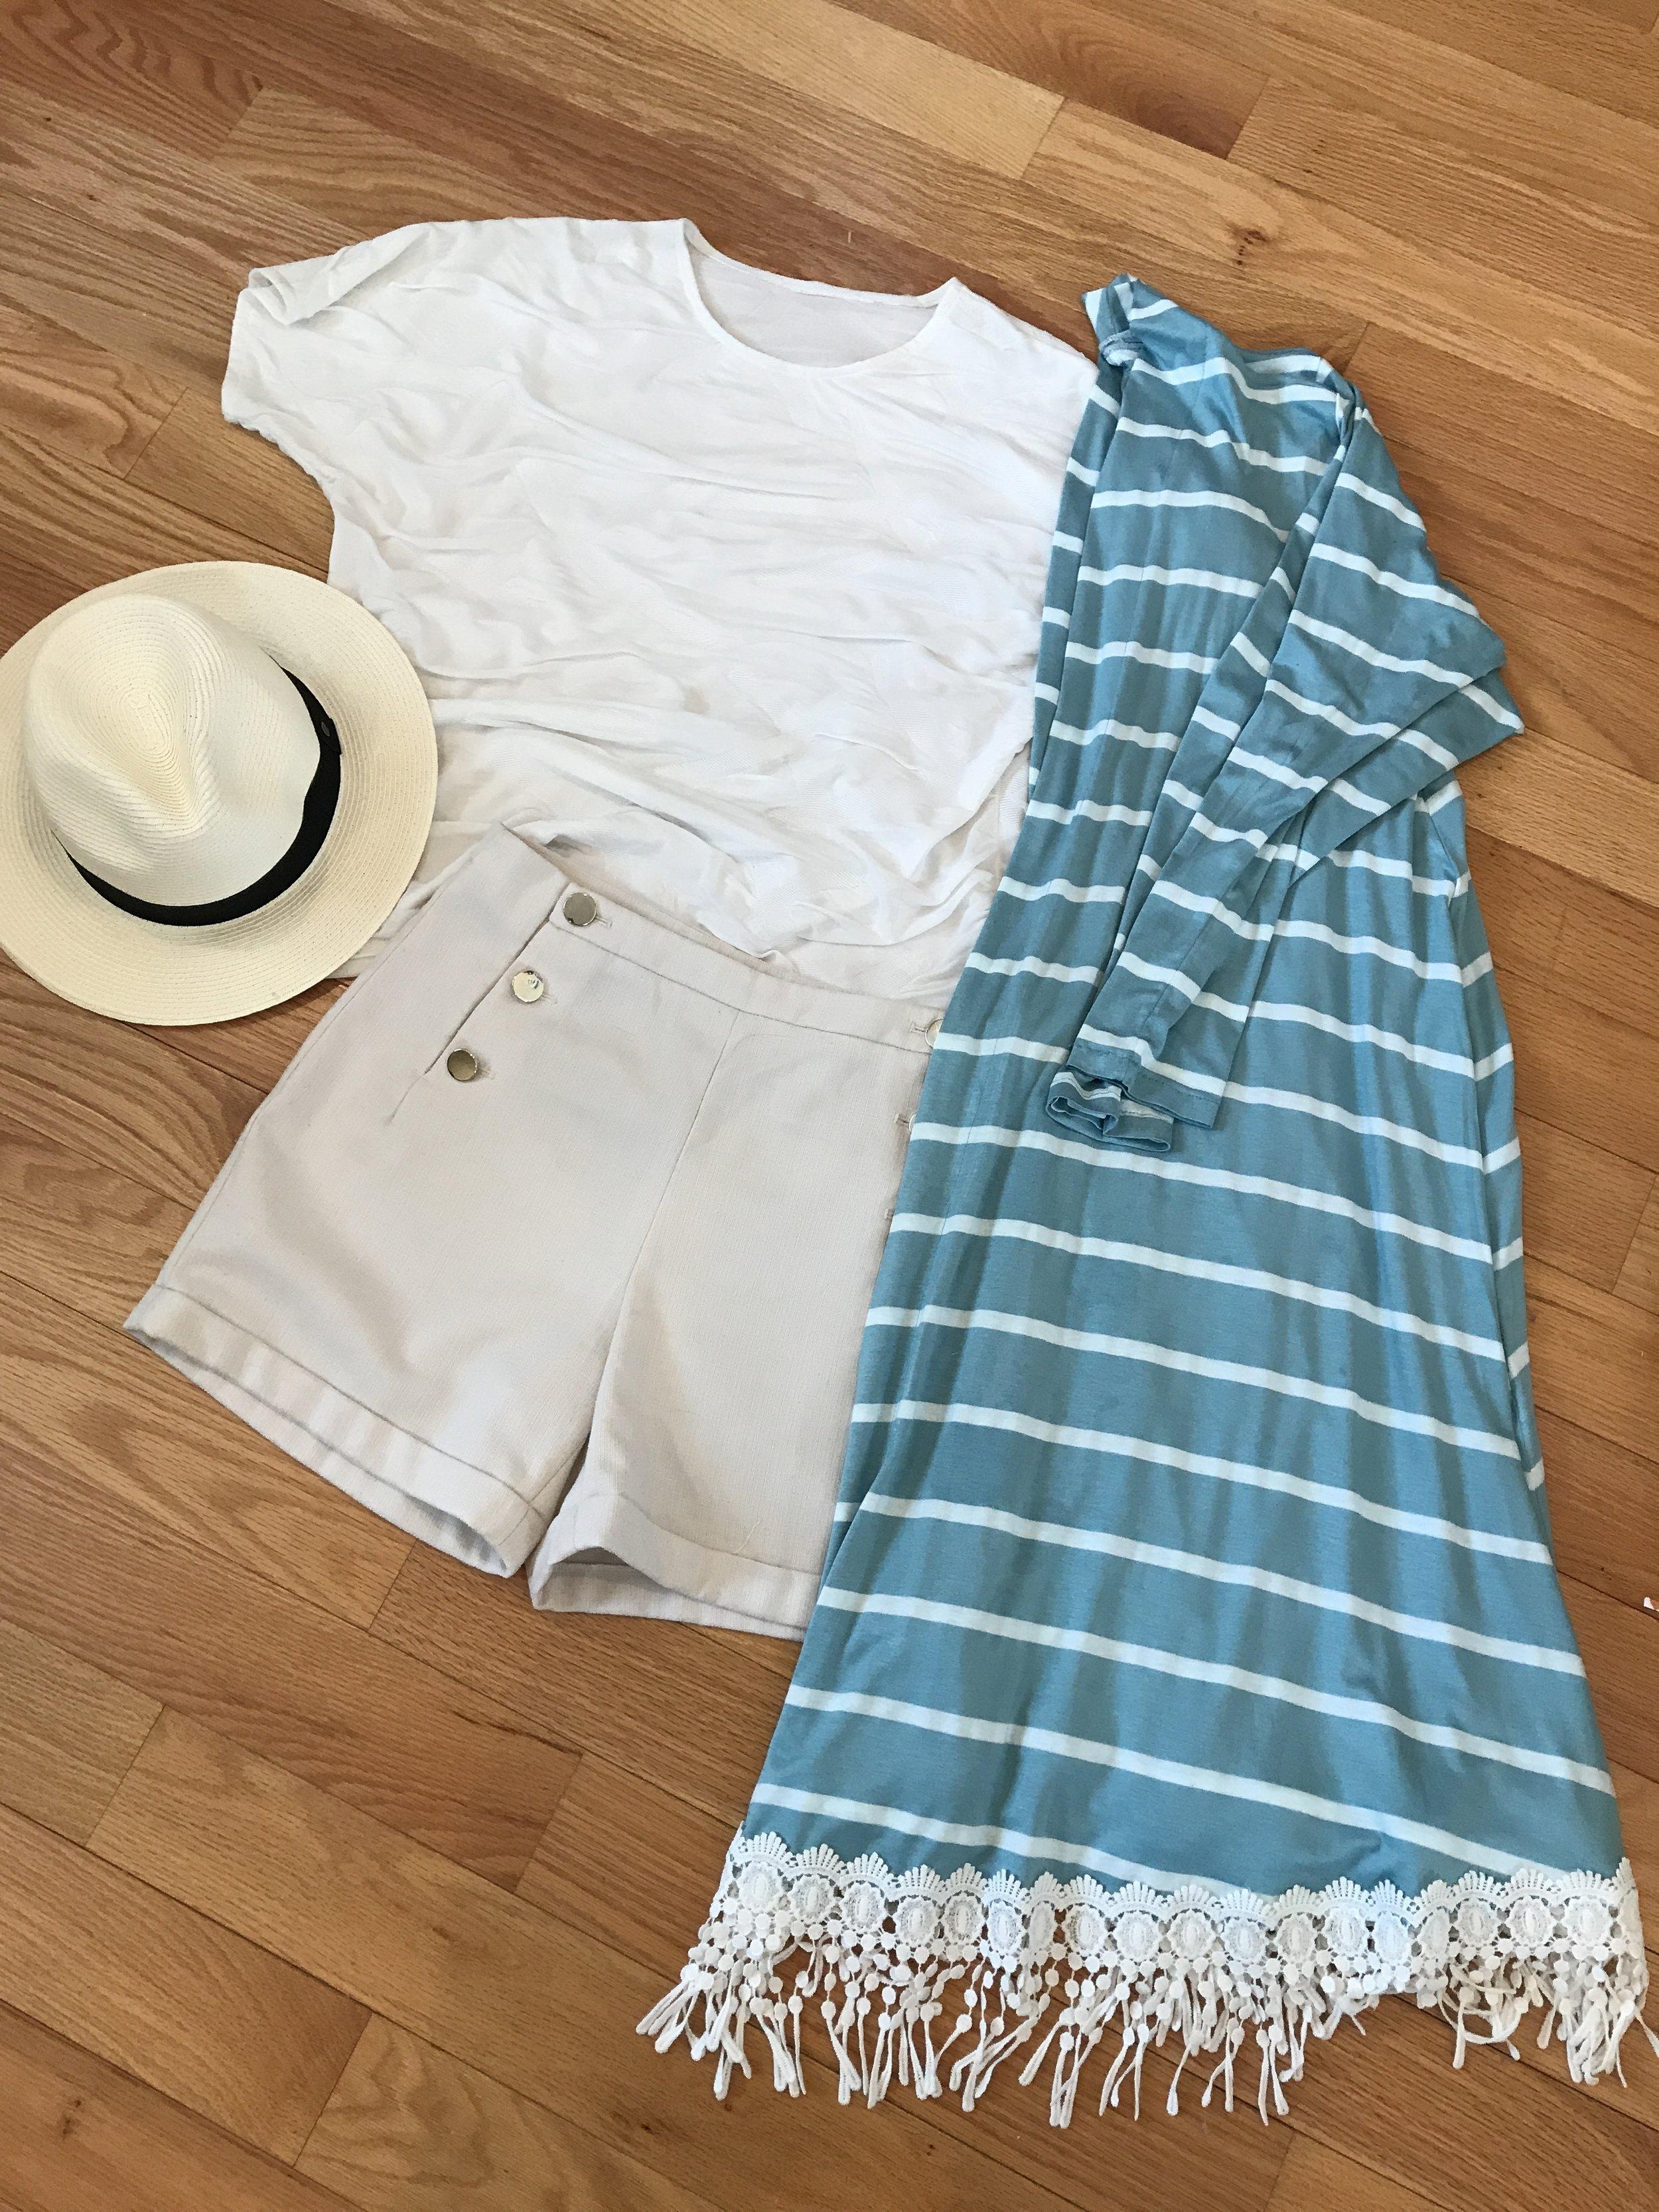 Sewing a Spring Break Capsule Wardrobe with Christine Jonson Patterns   long swing cardigan, long short sleeve tee